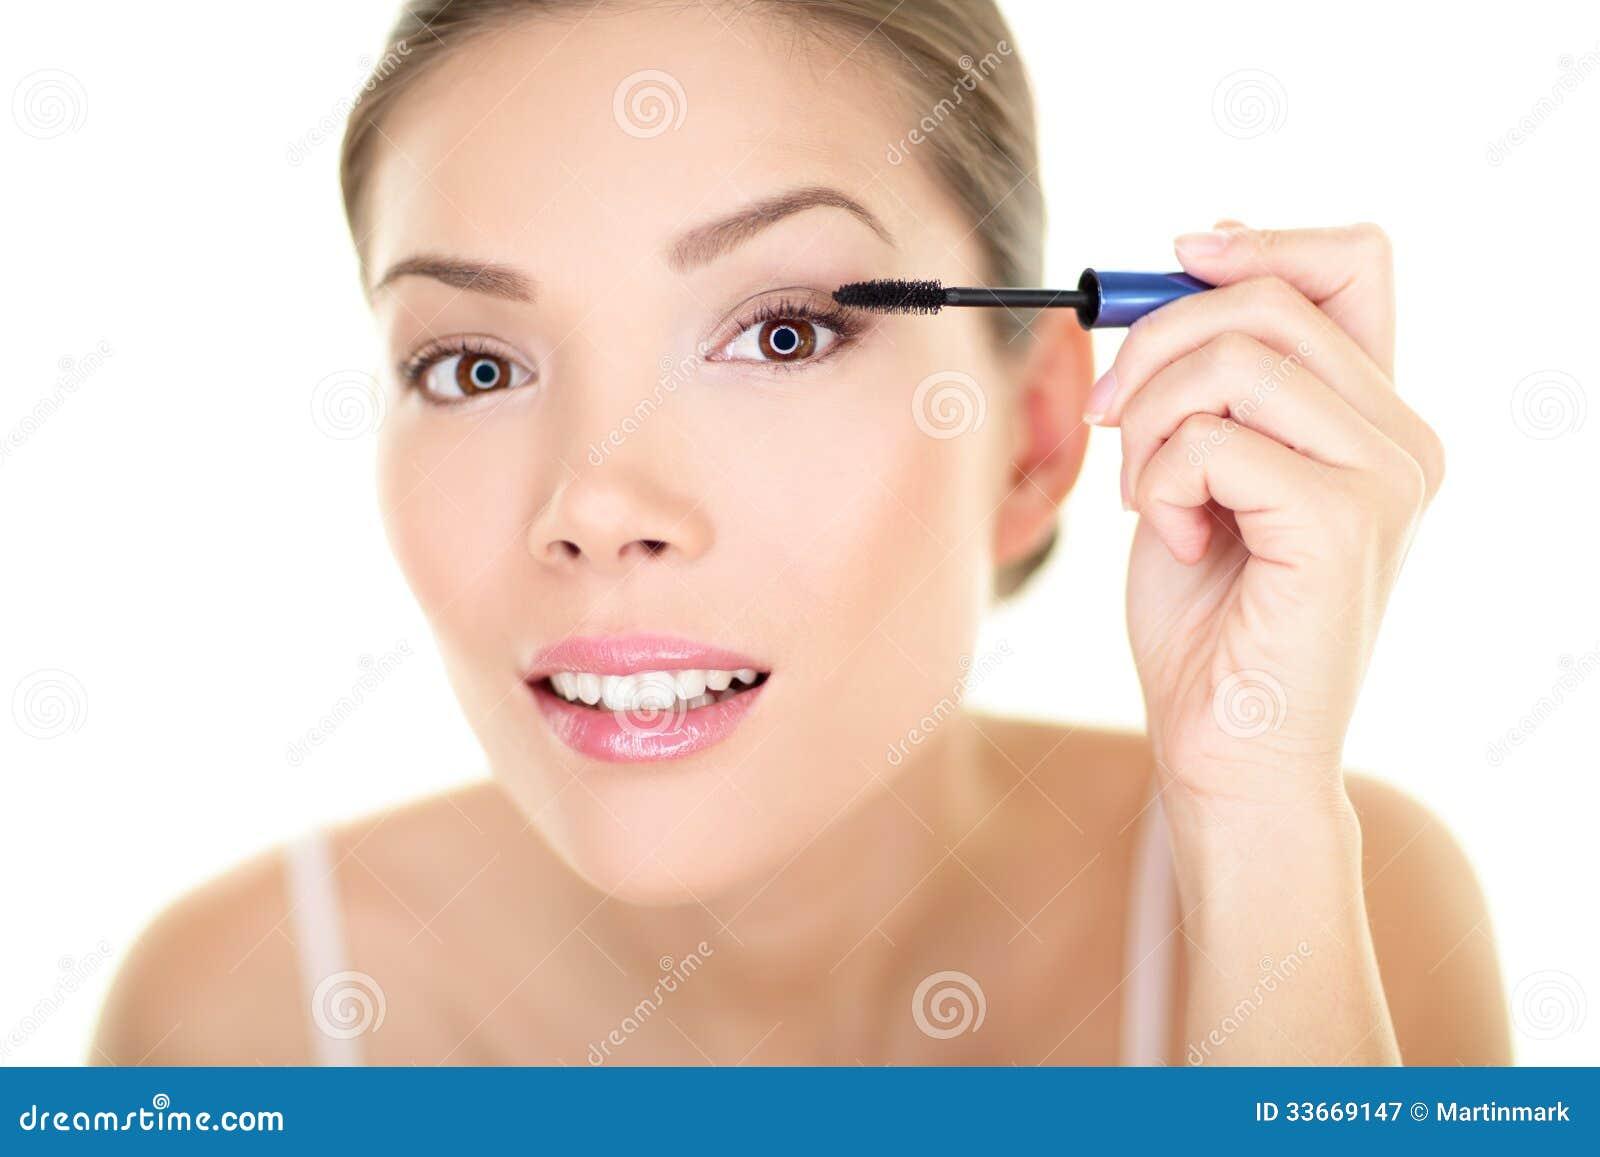 Beauty makeup woman putting mascara eye make up